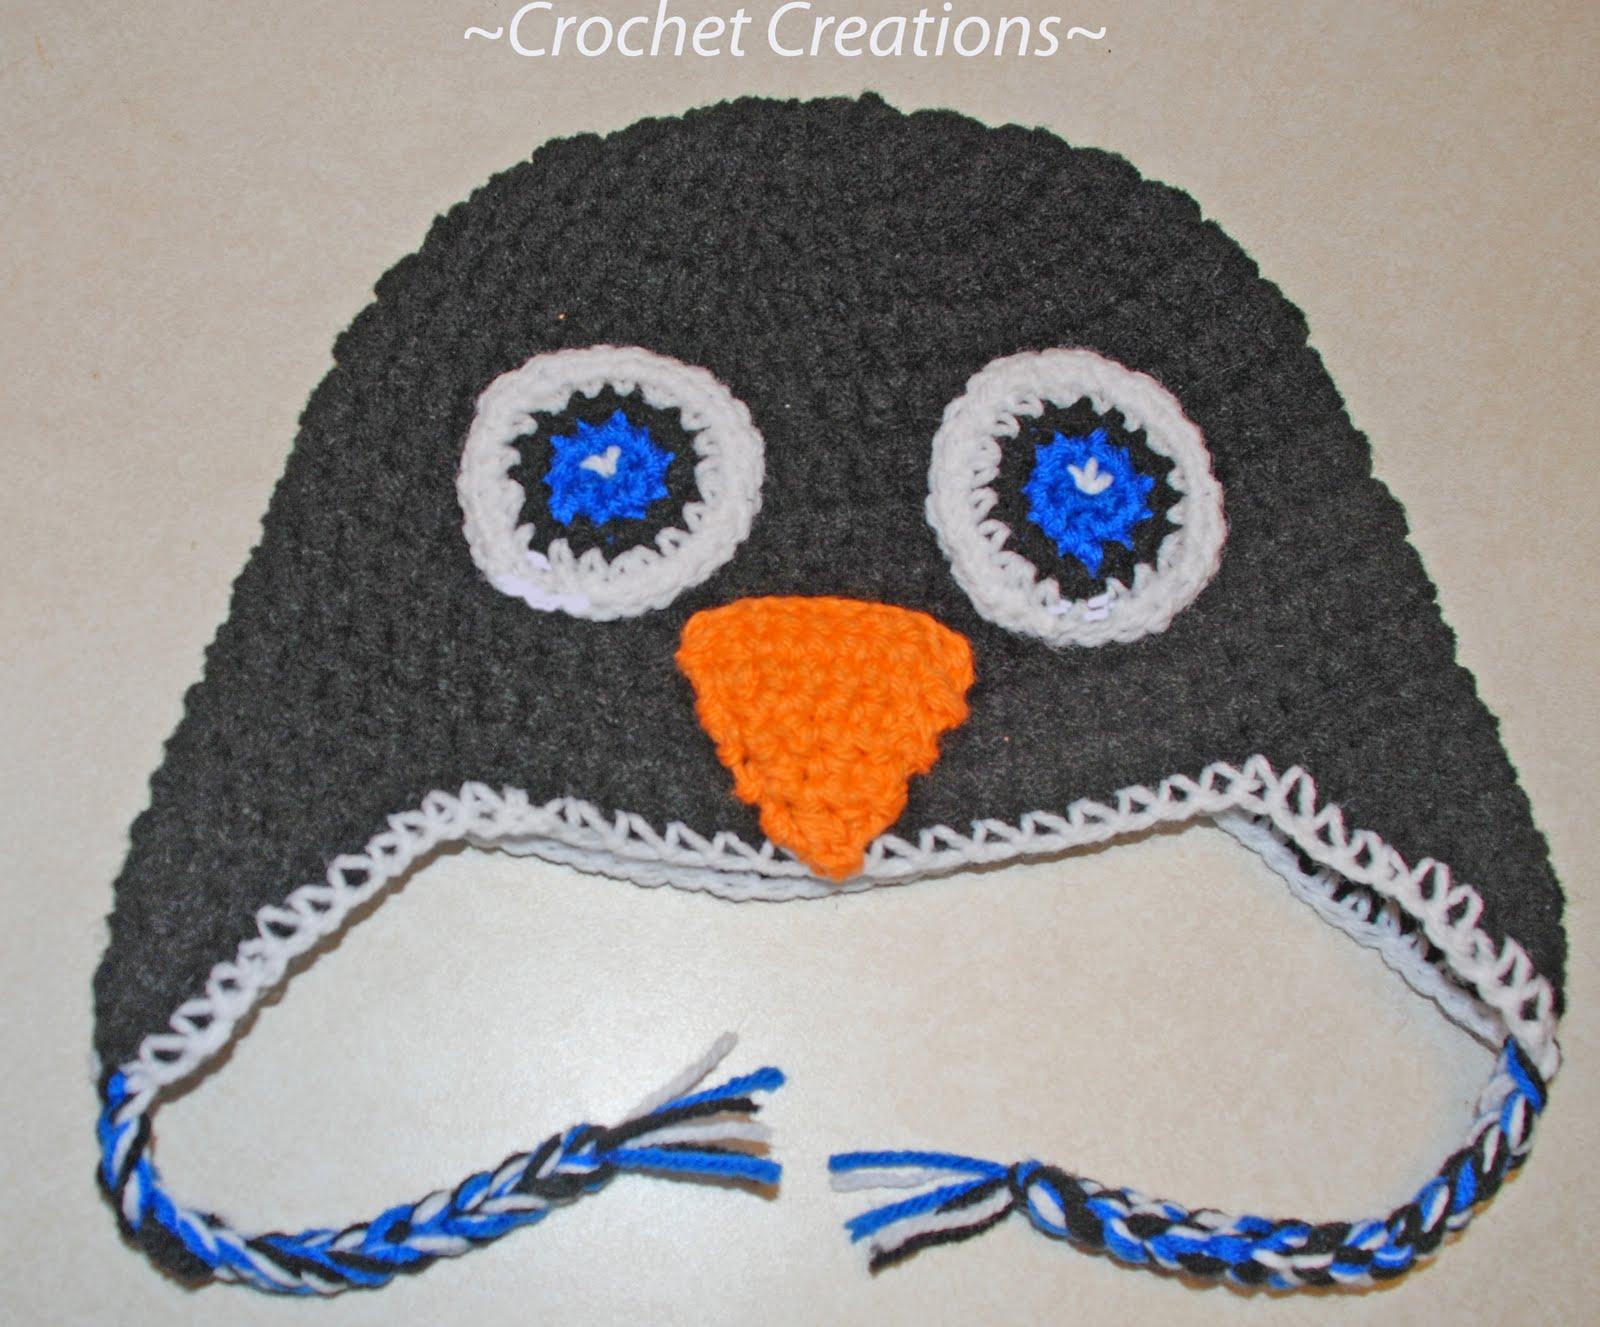 Amys Crochet Creative Creations Crochet Penguin Ear Flap Hat All